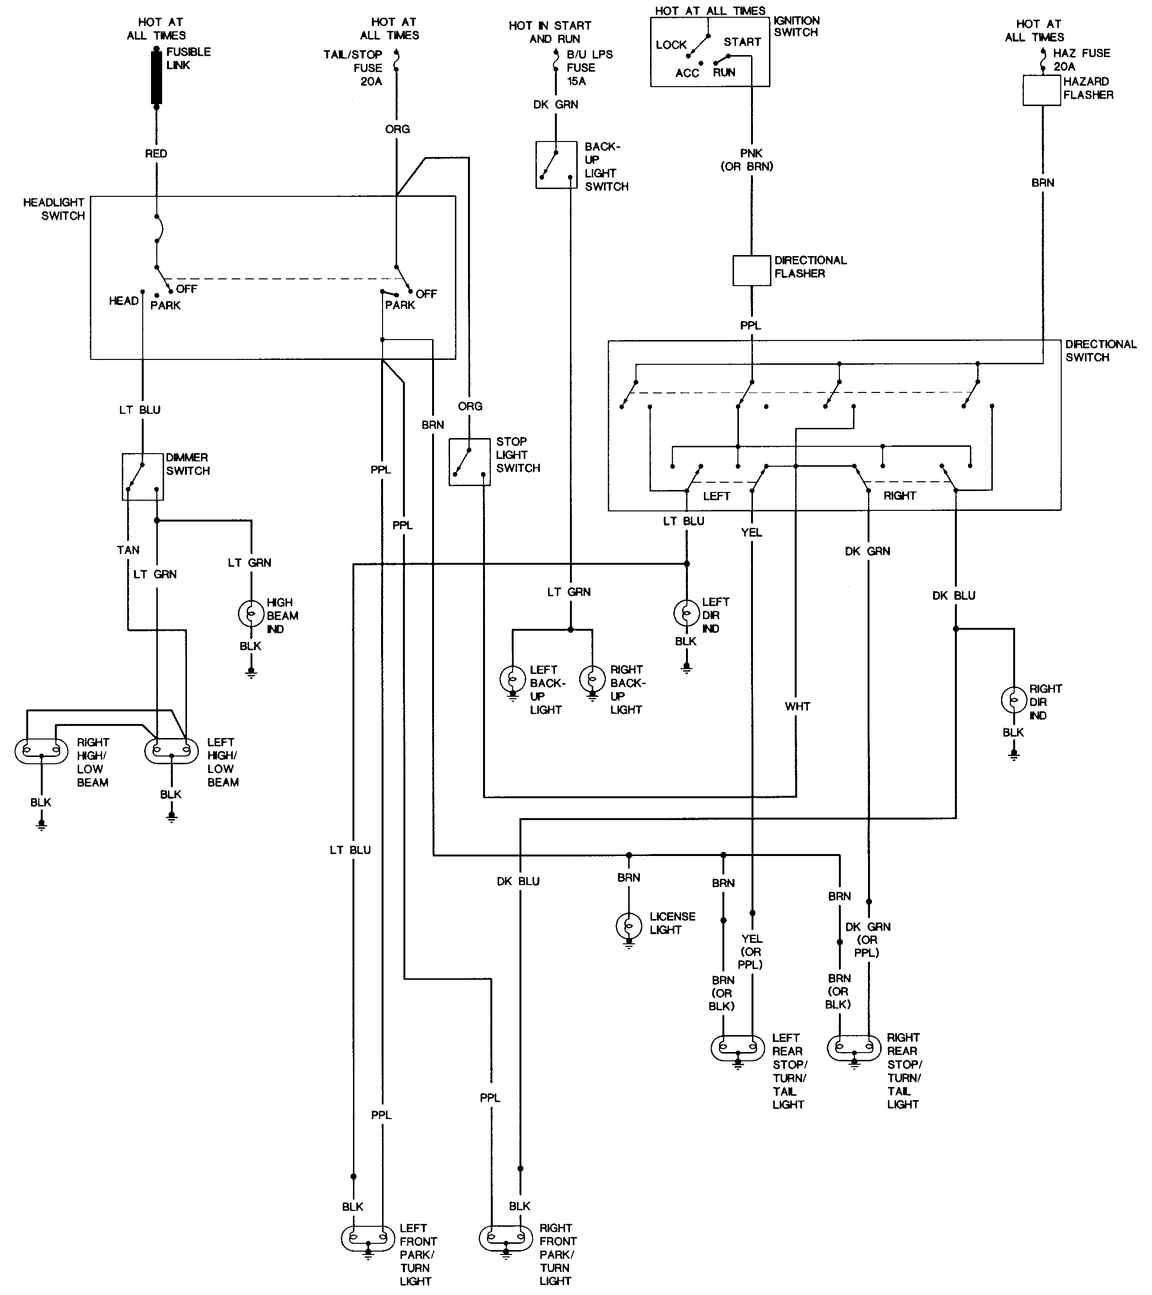 2000 Chevrolet Express Wiring Diagram 04 Gm Trailer Wiring Diagram Bege Wiring Diagram